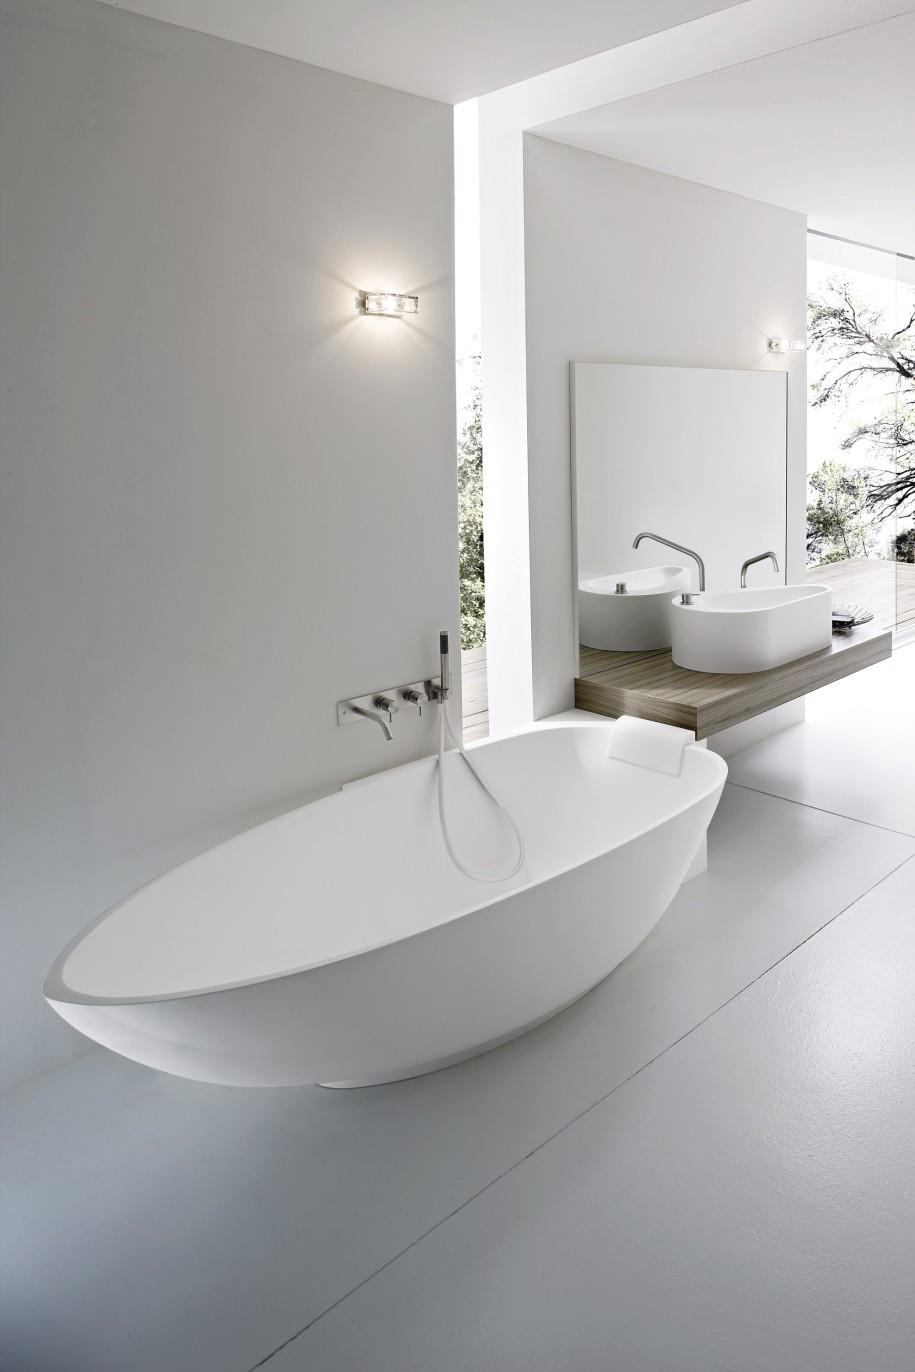 Elegant 60 Freestanding soaking Tub Photos Of Bathtub Decoration